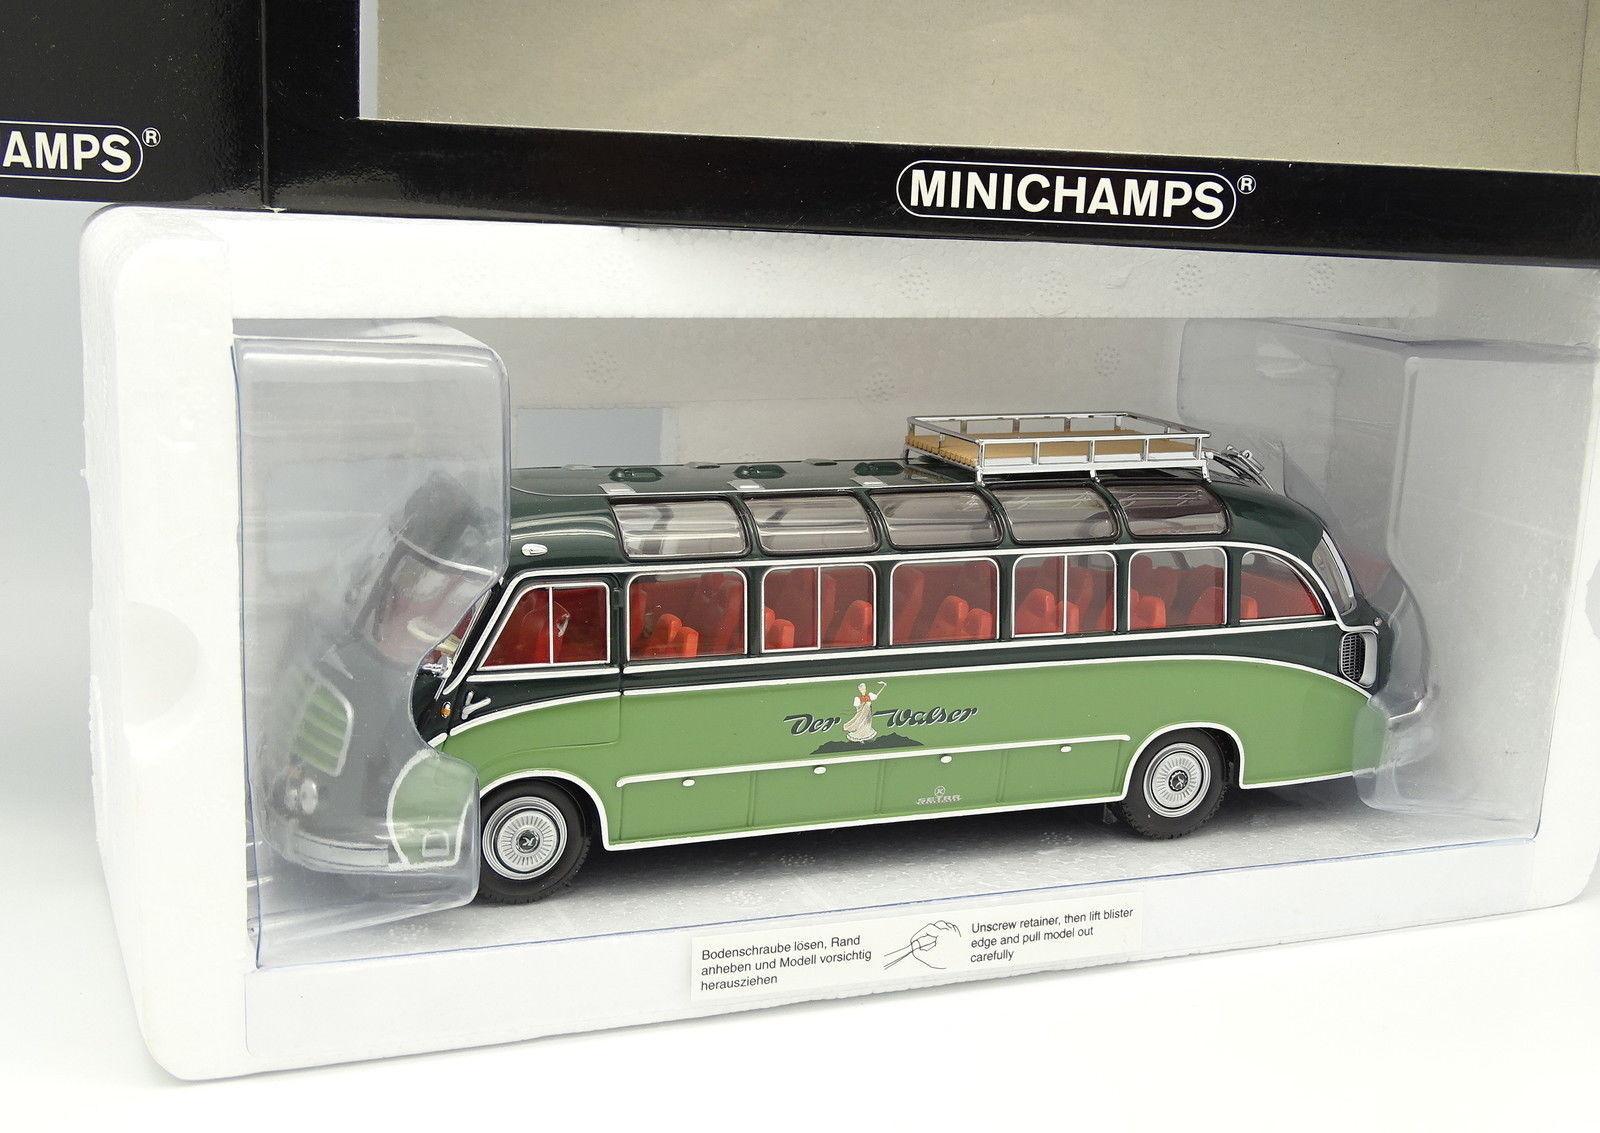 Minichamps 1 43 - Coche AutoCoche Setra S8 Der Walser Reisen